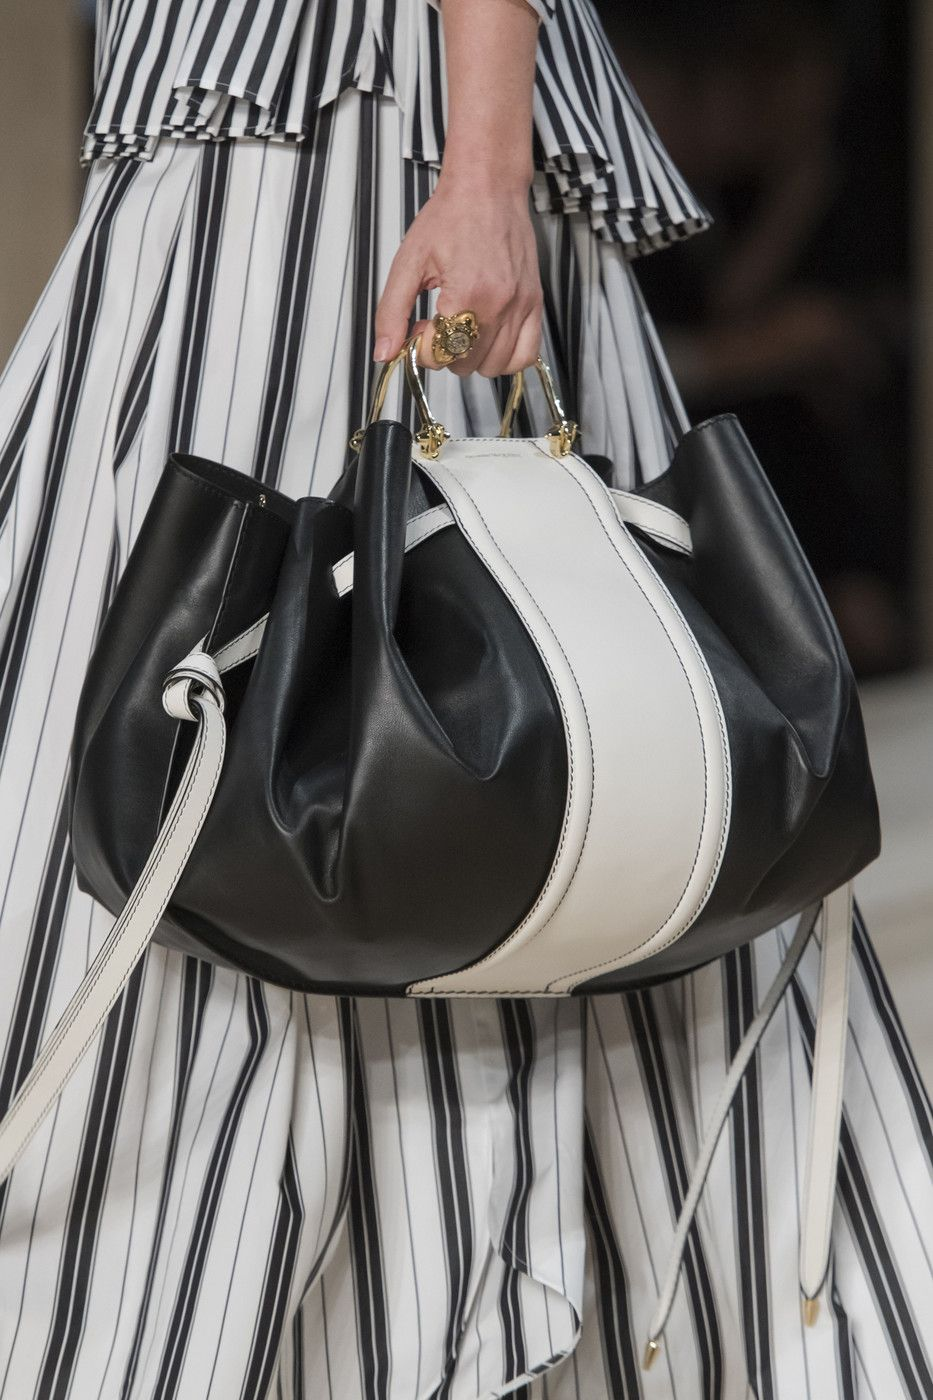 Chloé at Paris Fashion Week Spring 2020 w 2020 | Torby